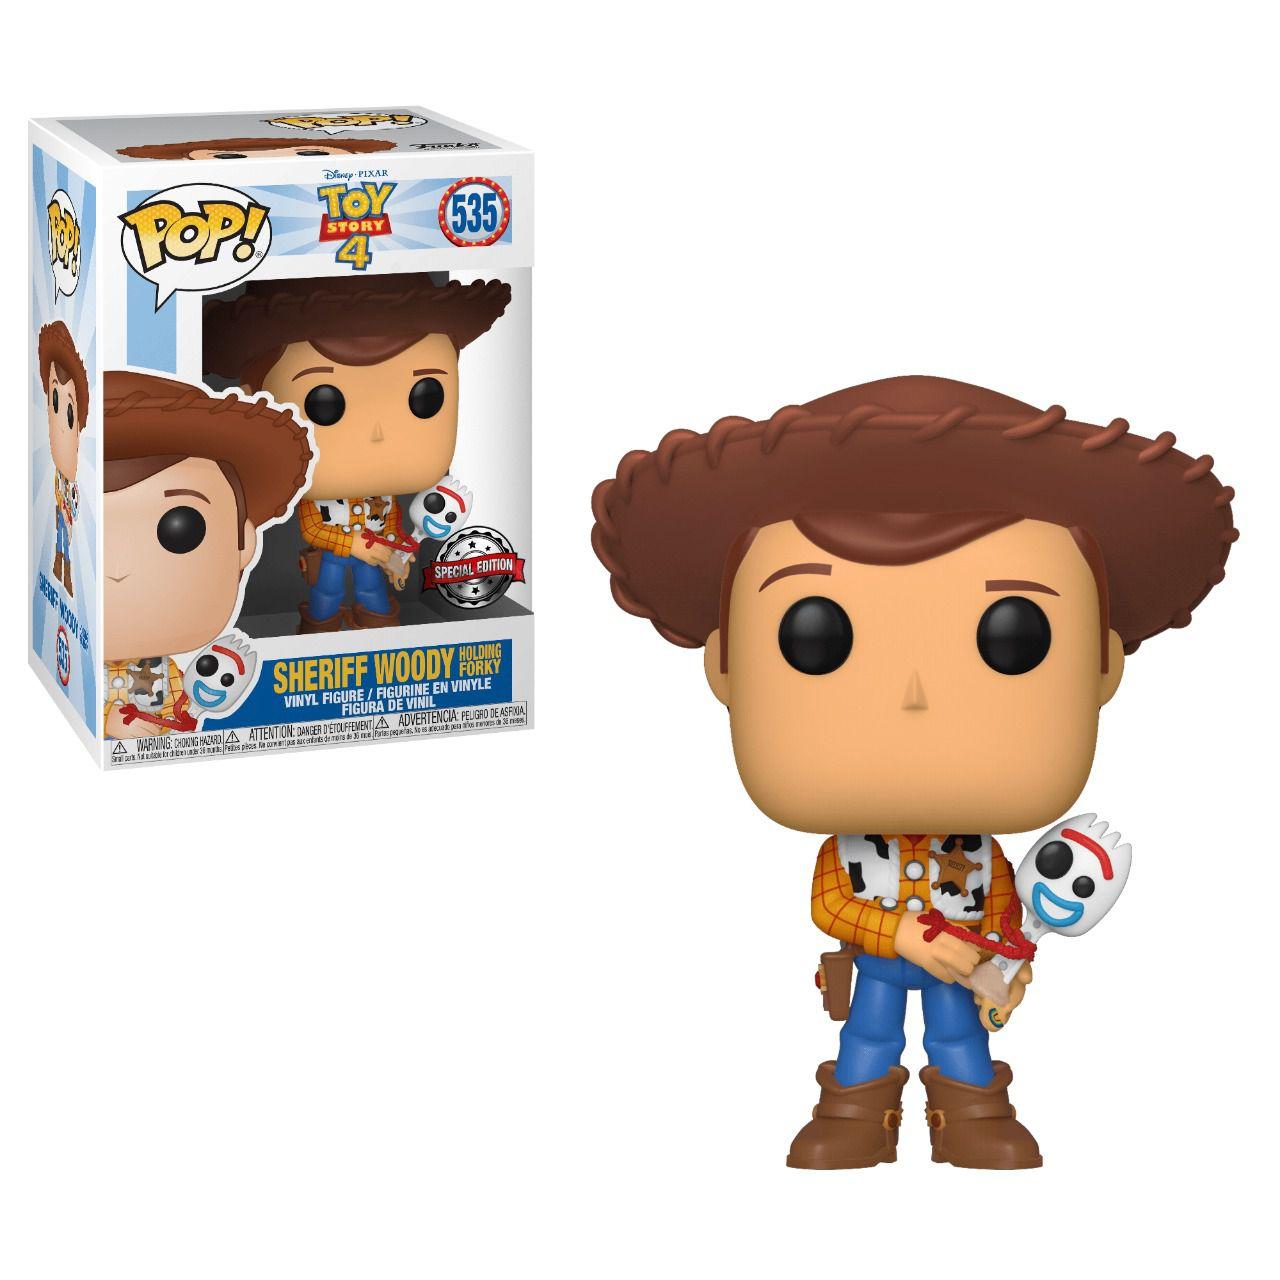 Pop! Woody Com Garfinho (Holding Forky): Toy Story 4 (Disney) Exclusivo #535 - Funko